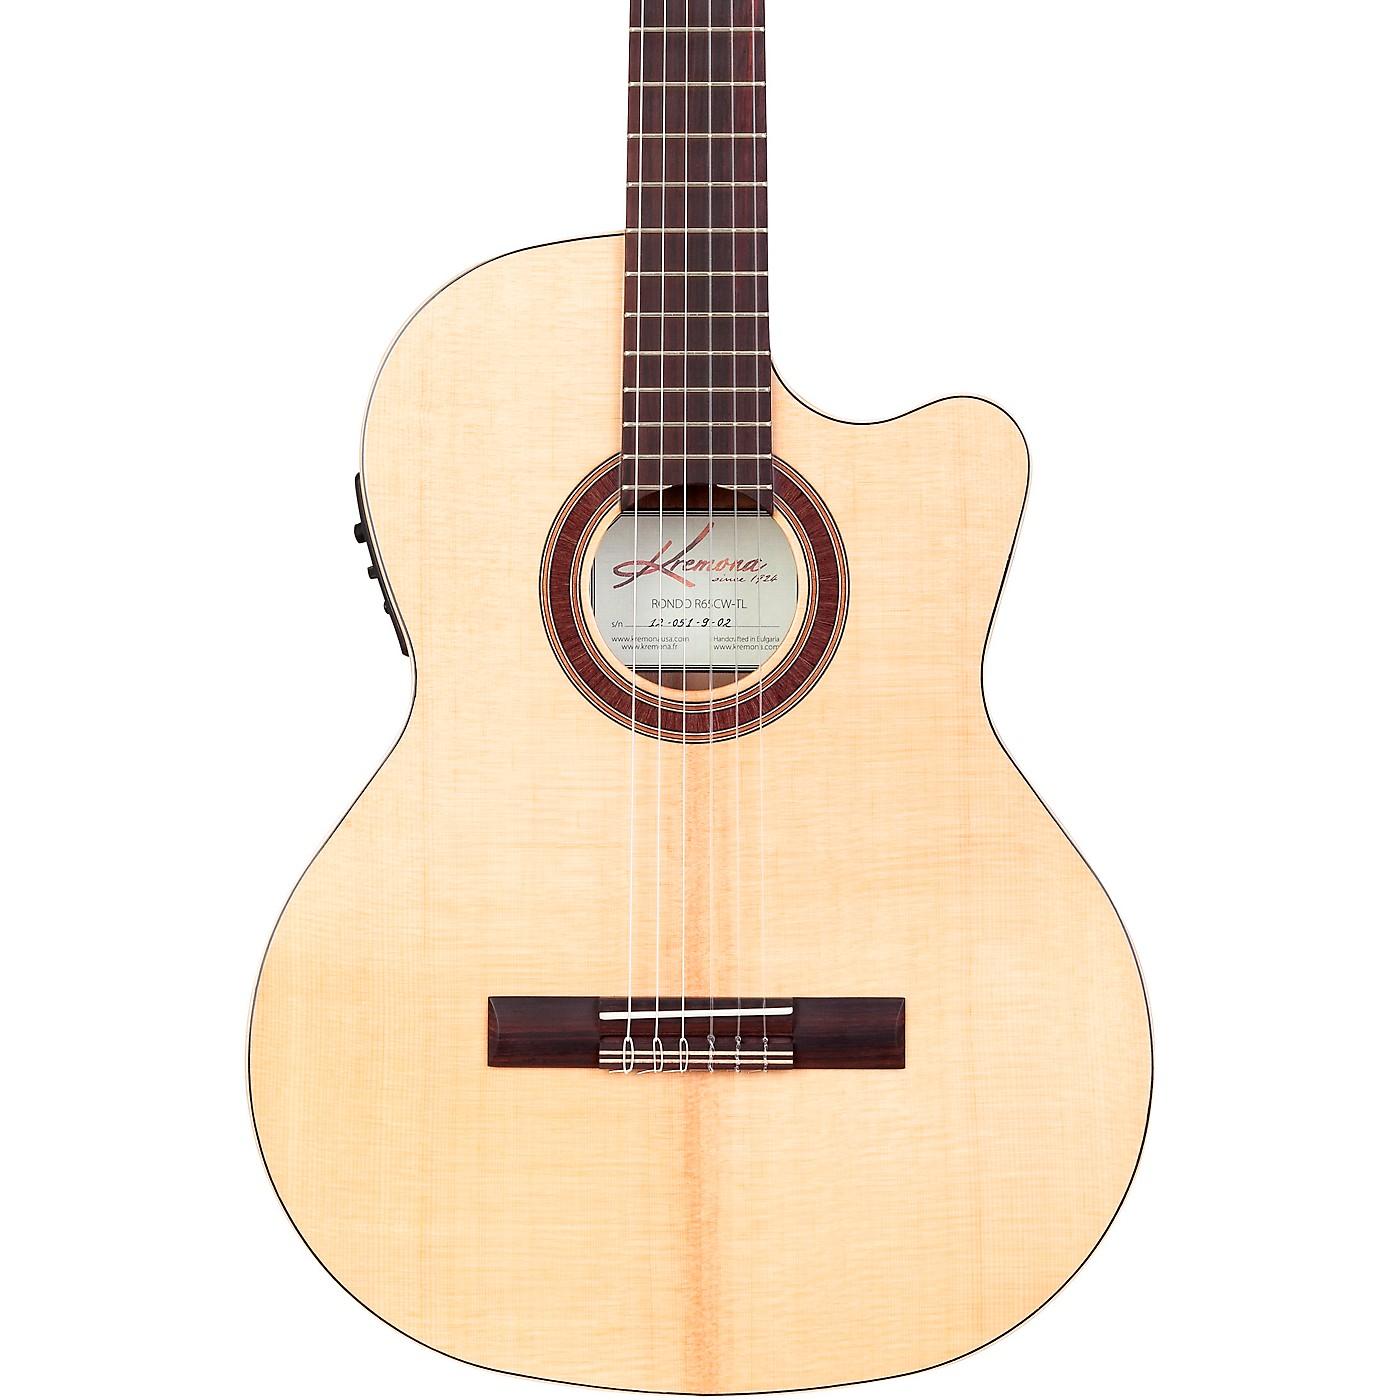 Kremona Rondo Thin Line Classical Acoustic-Electric Guitar thumbnail